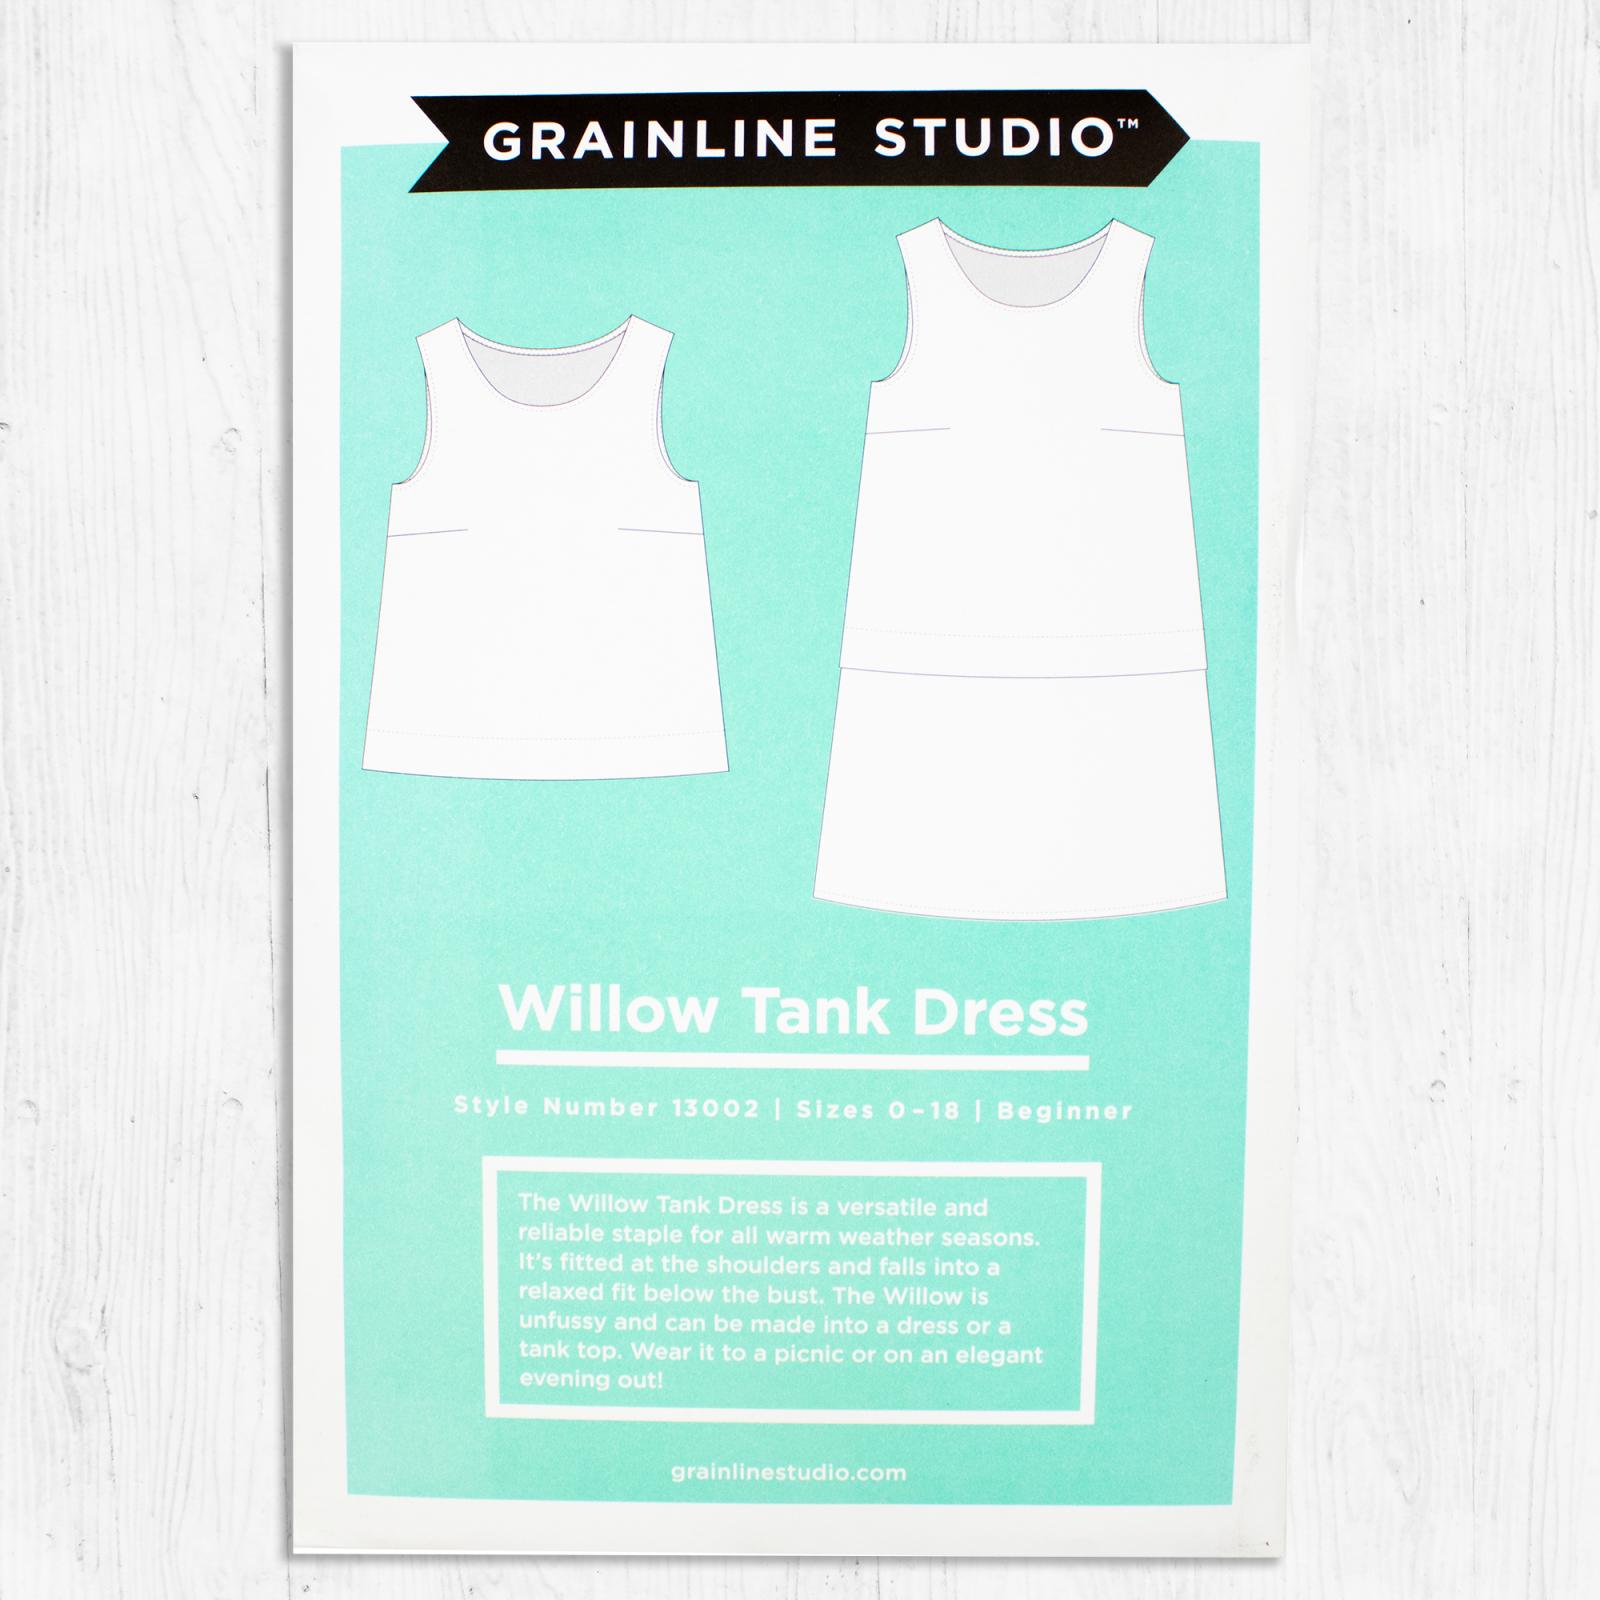 Grainline Studios - Willow Tank Dress